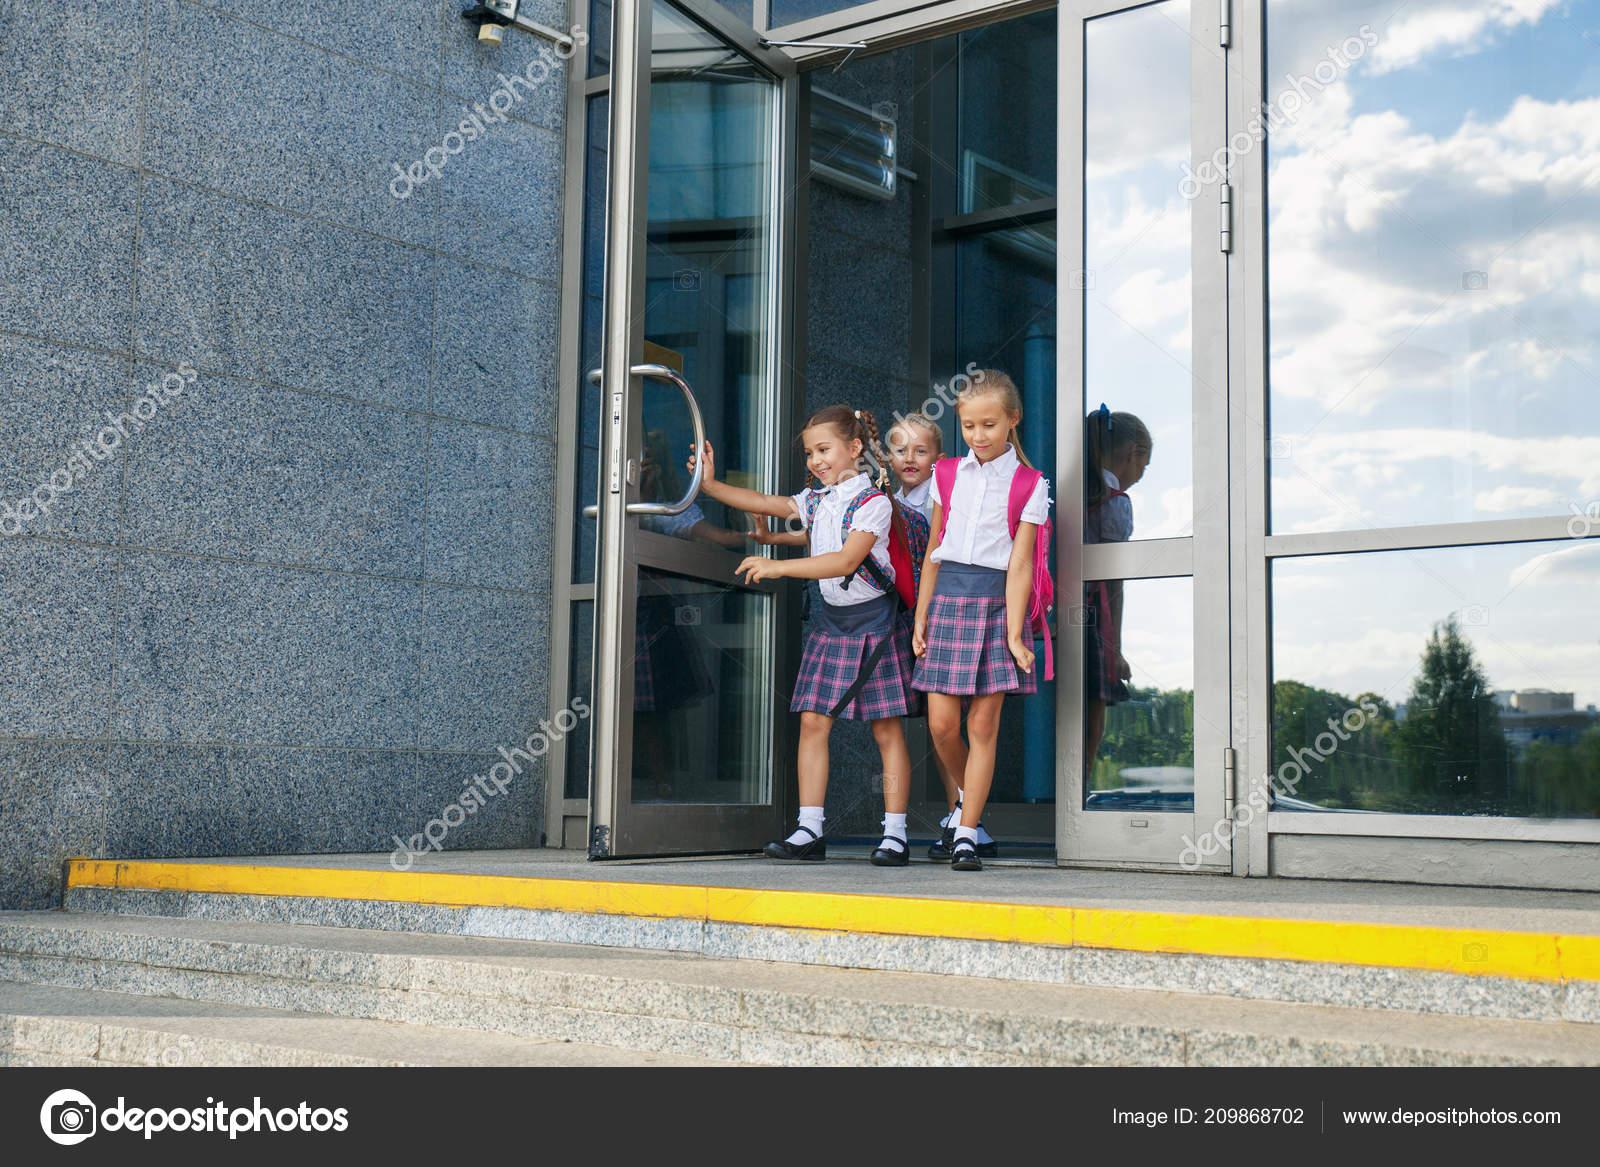 1fe65c95816 Πορτρέτο της τα παιδιά σχολείο με σακίδιο πλάτης να τρέχει μετά το σχολείο.  Έναρξη των μαθημάτων. Πρώτη ημέρα της πτώσης — Εικόνα από ...